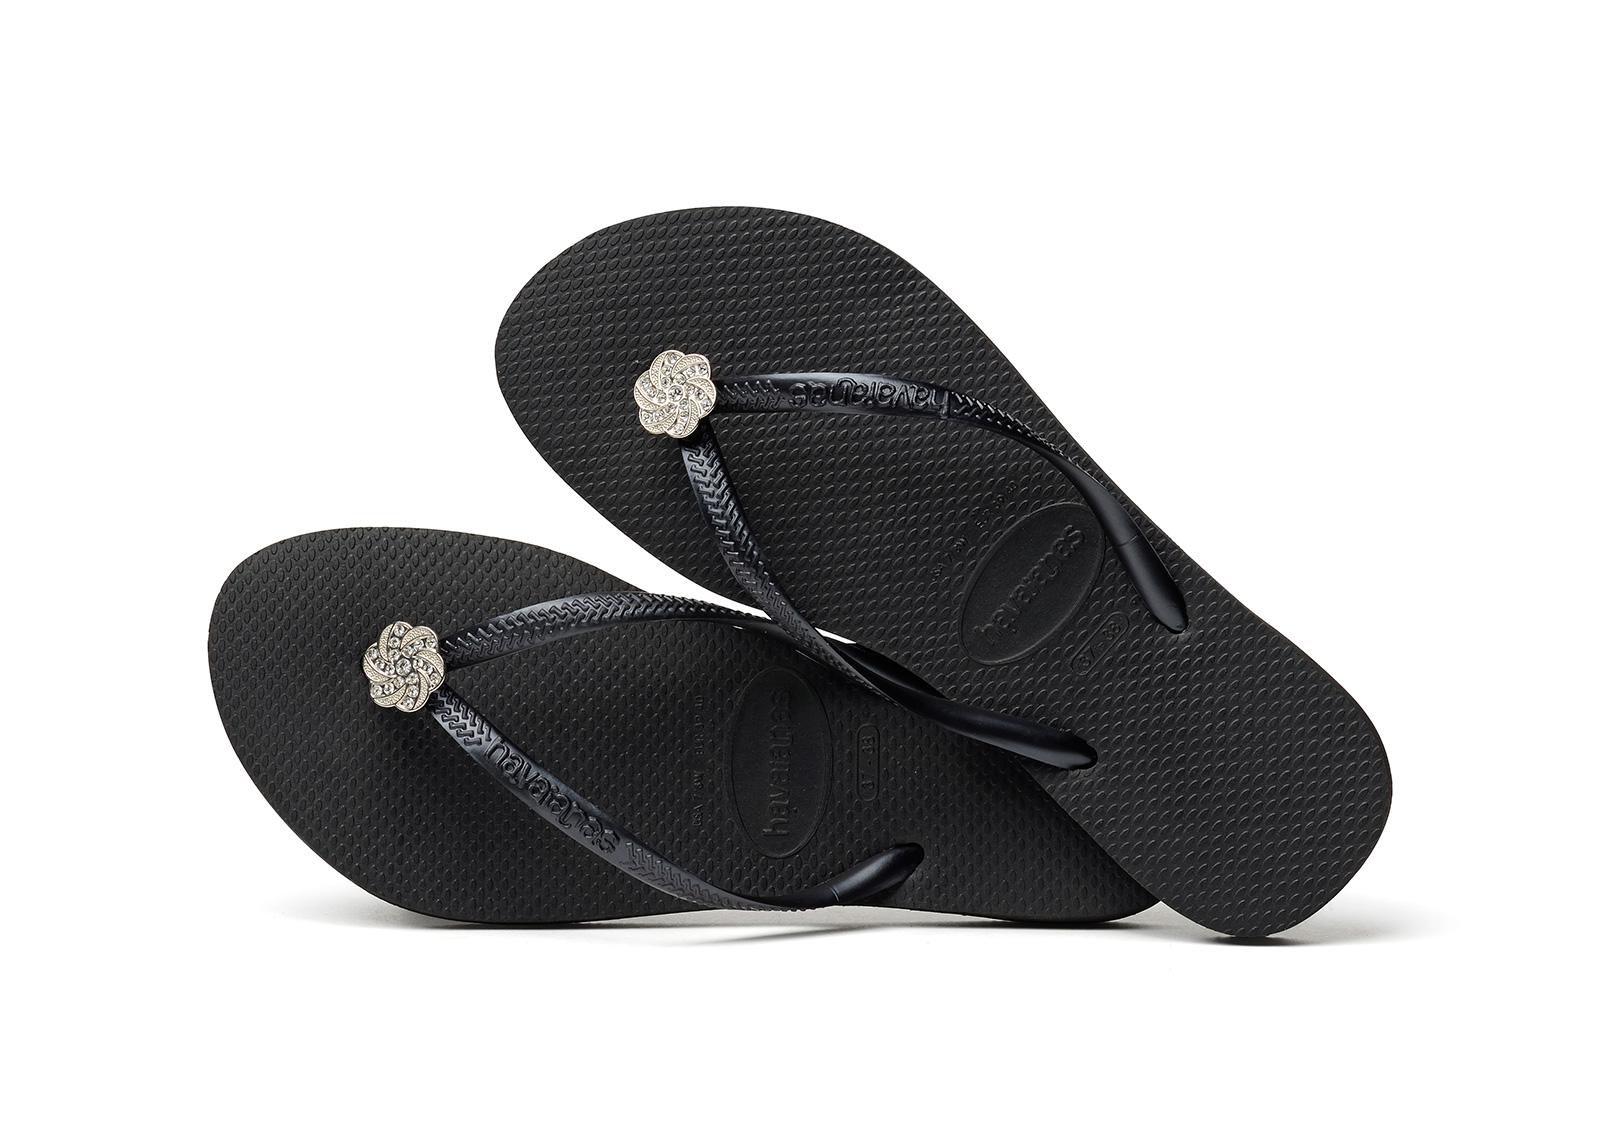 3c4704cb59910b ... Black Flip Flops - Havaianas Slim Crystal Poem Black Graphite ...